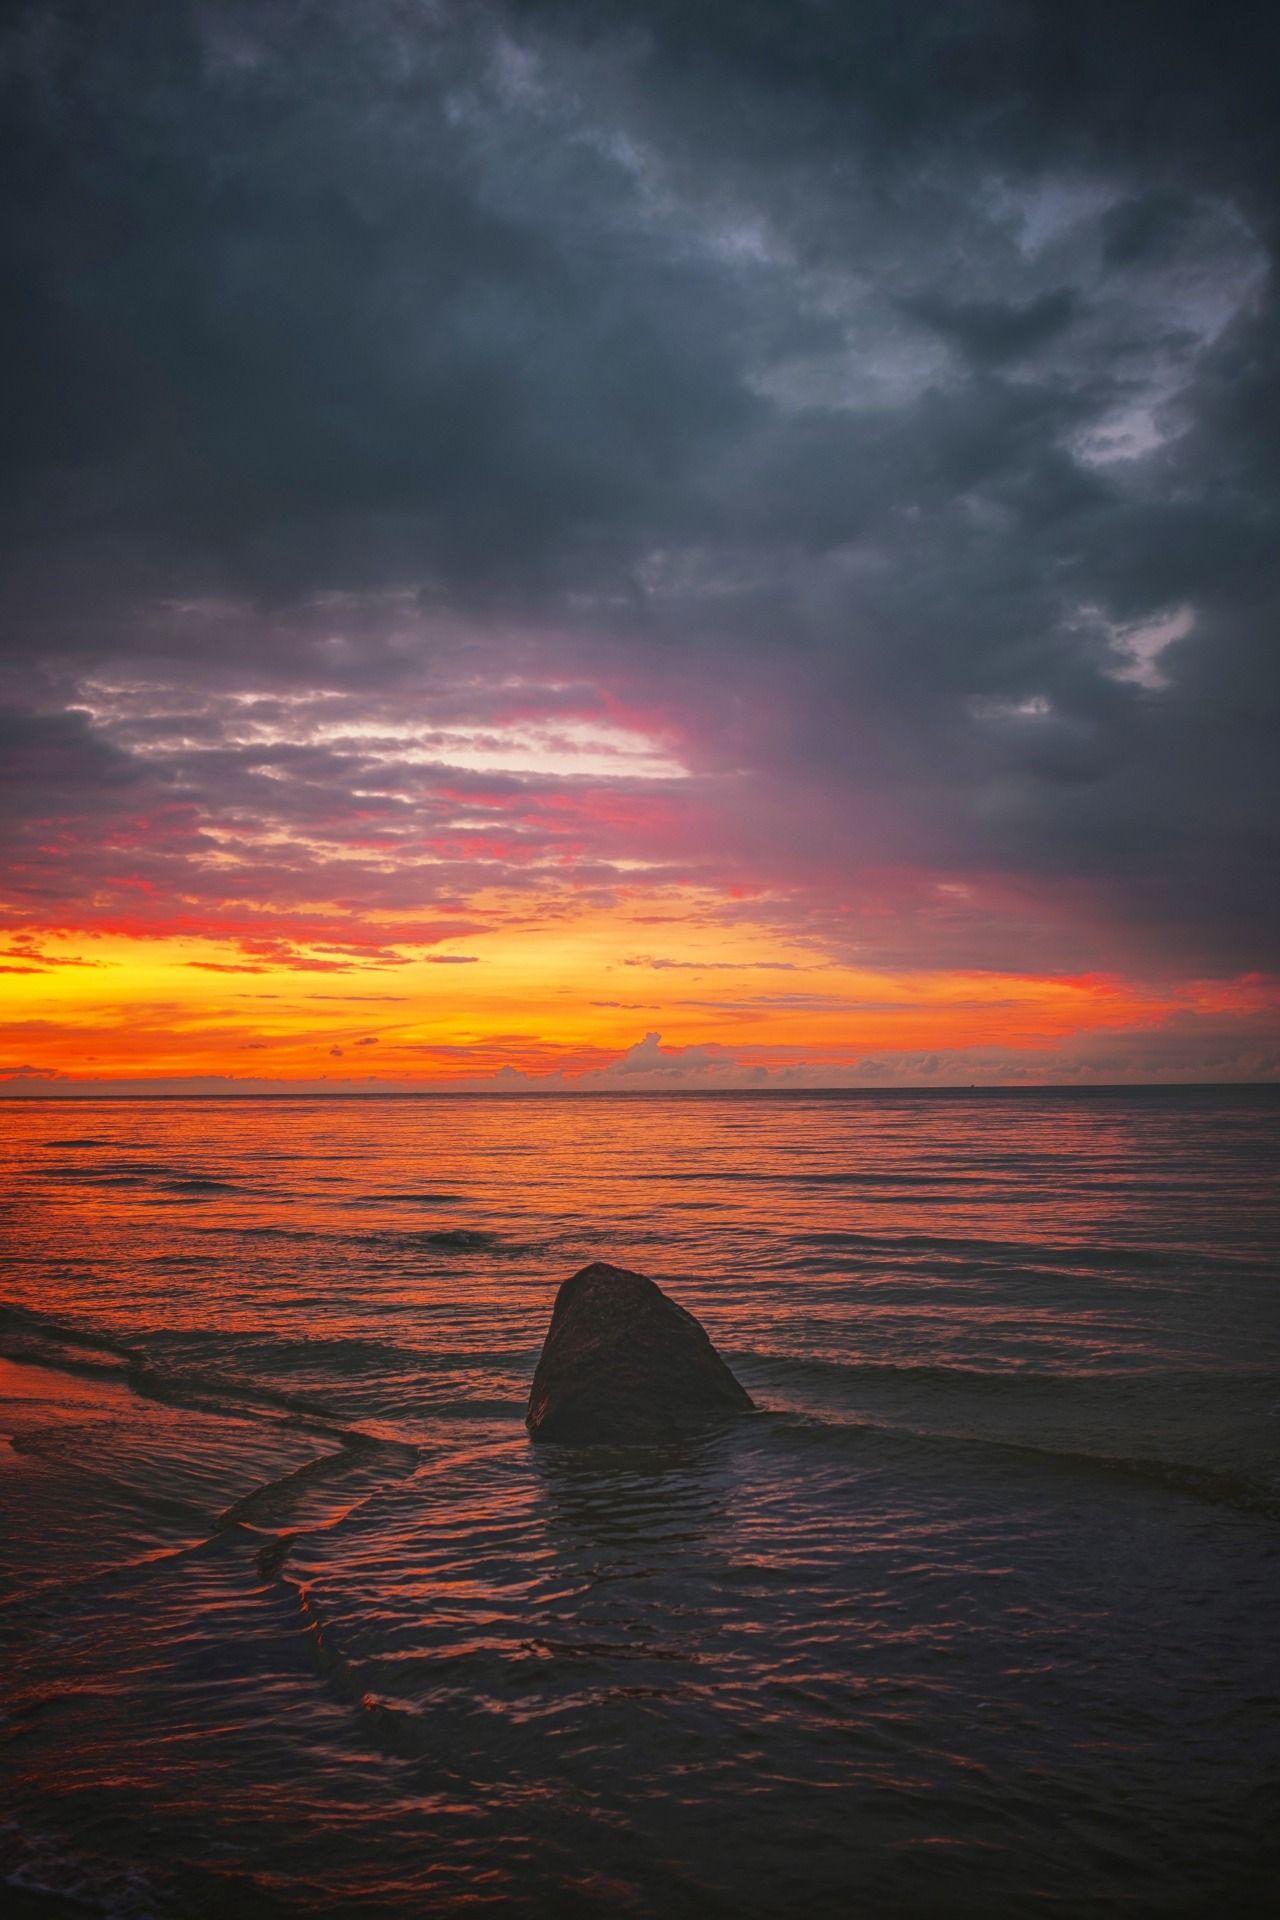 Relic - #baltic #landscape #meolog #on #original #photographers #sea #source #sunset #tumblr #usedom